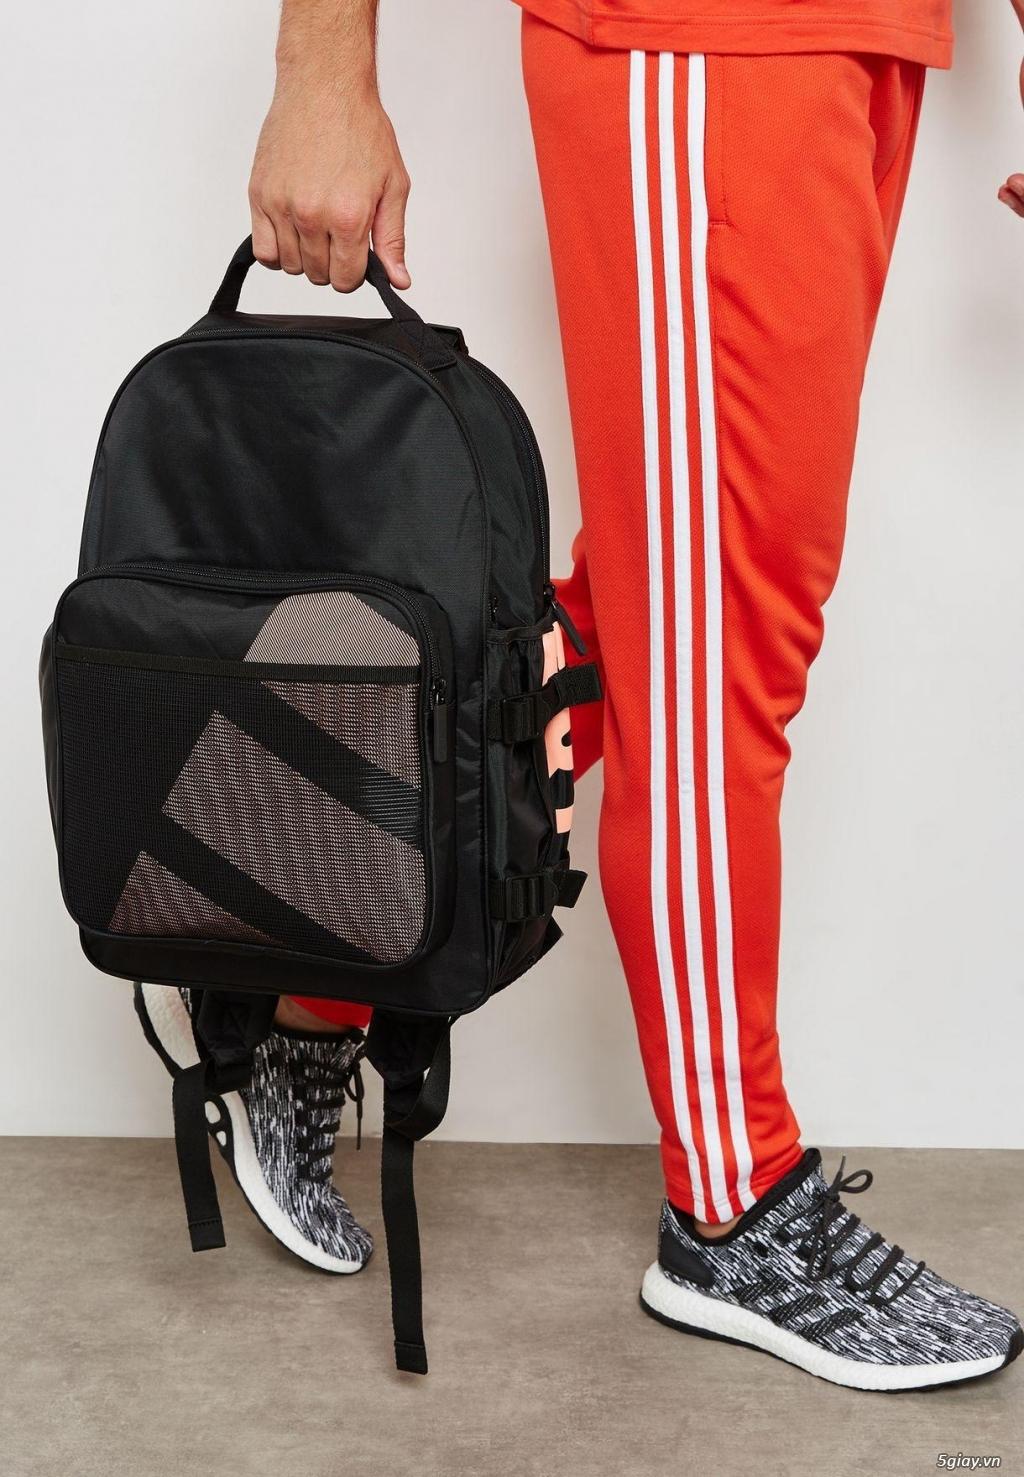 [S.U.E Store - Balo Chính Hãng VNXK] - Tổng hợp Balo Adidas - 5